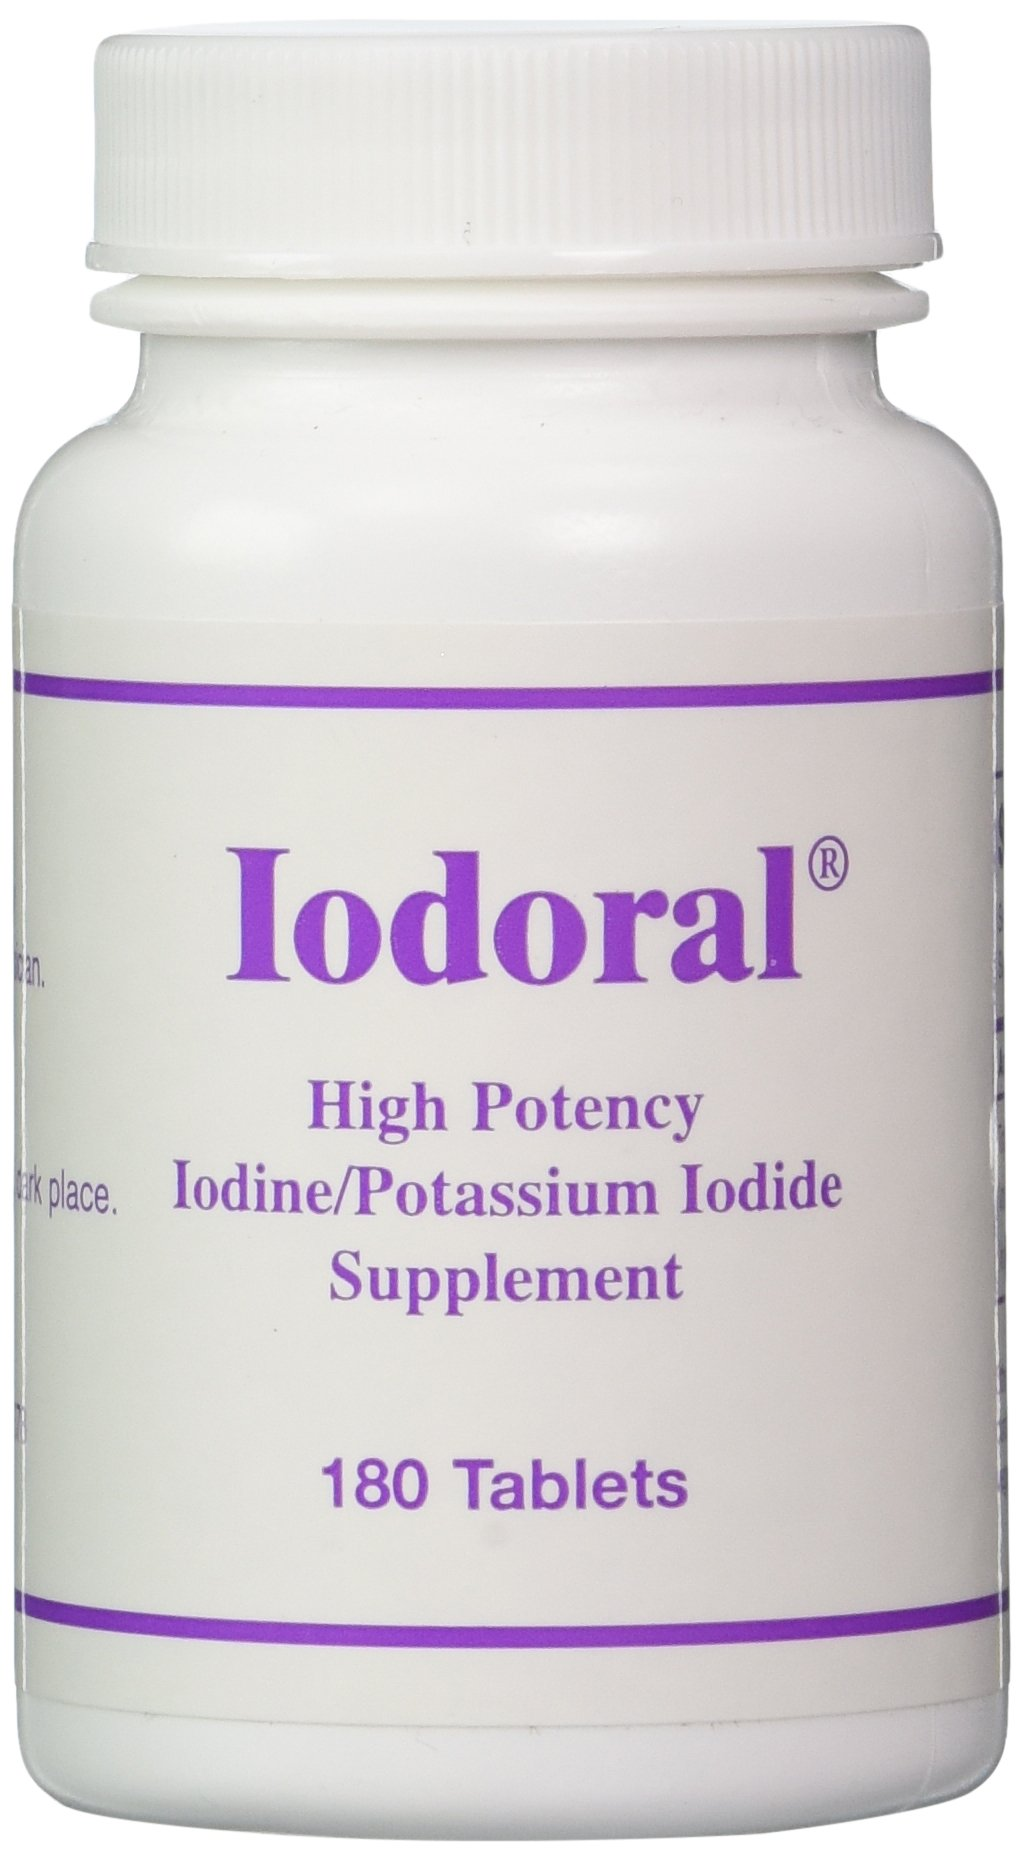 Optimox – Iodoral, High Potency Iodine Potassium Iodide Thyroid Support Supplement, 180 Tablets